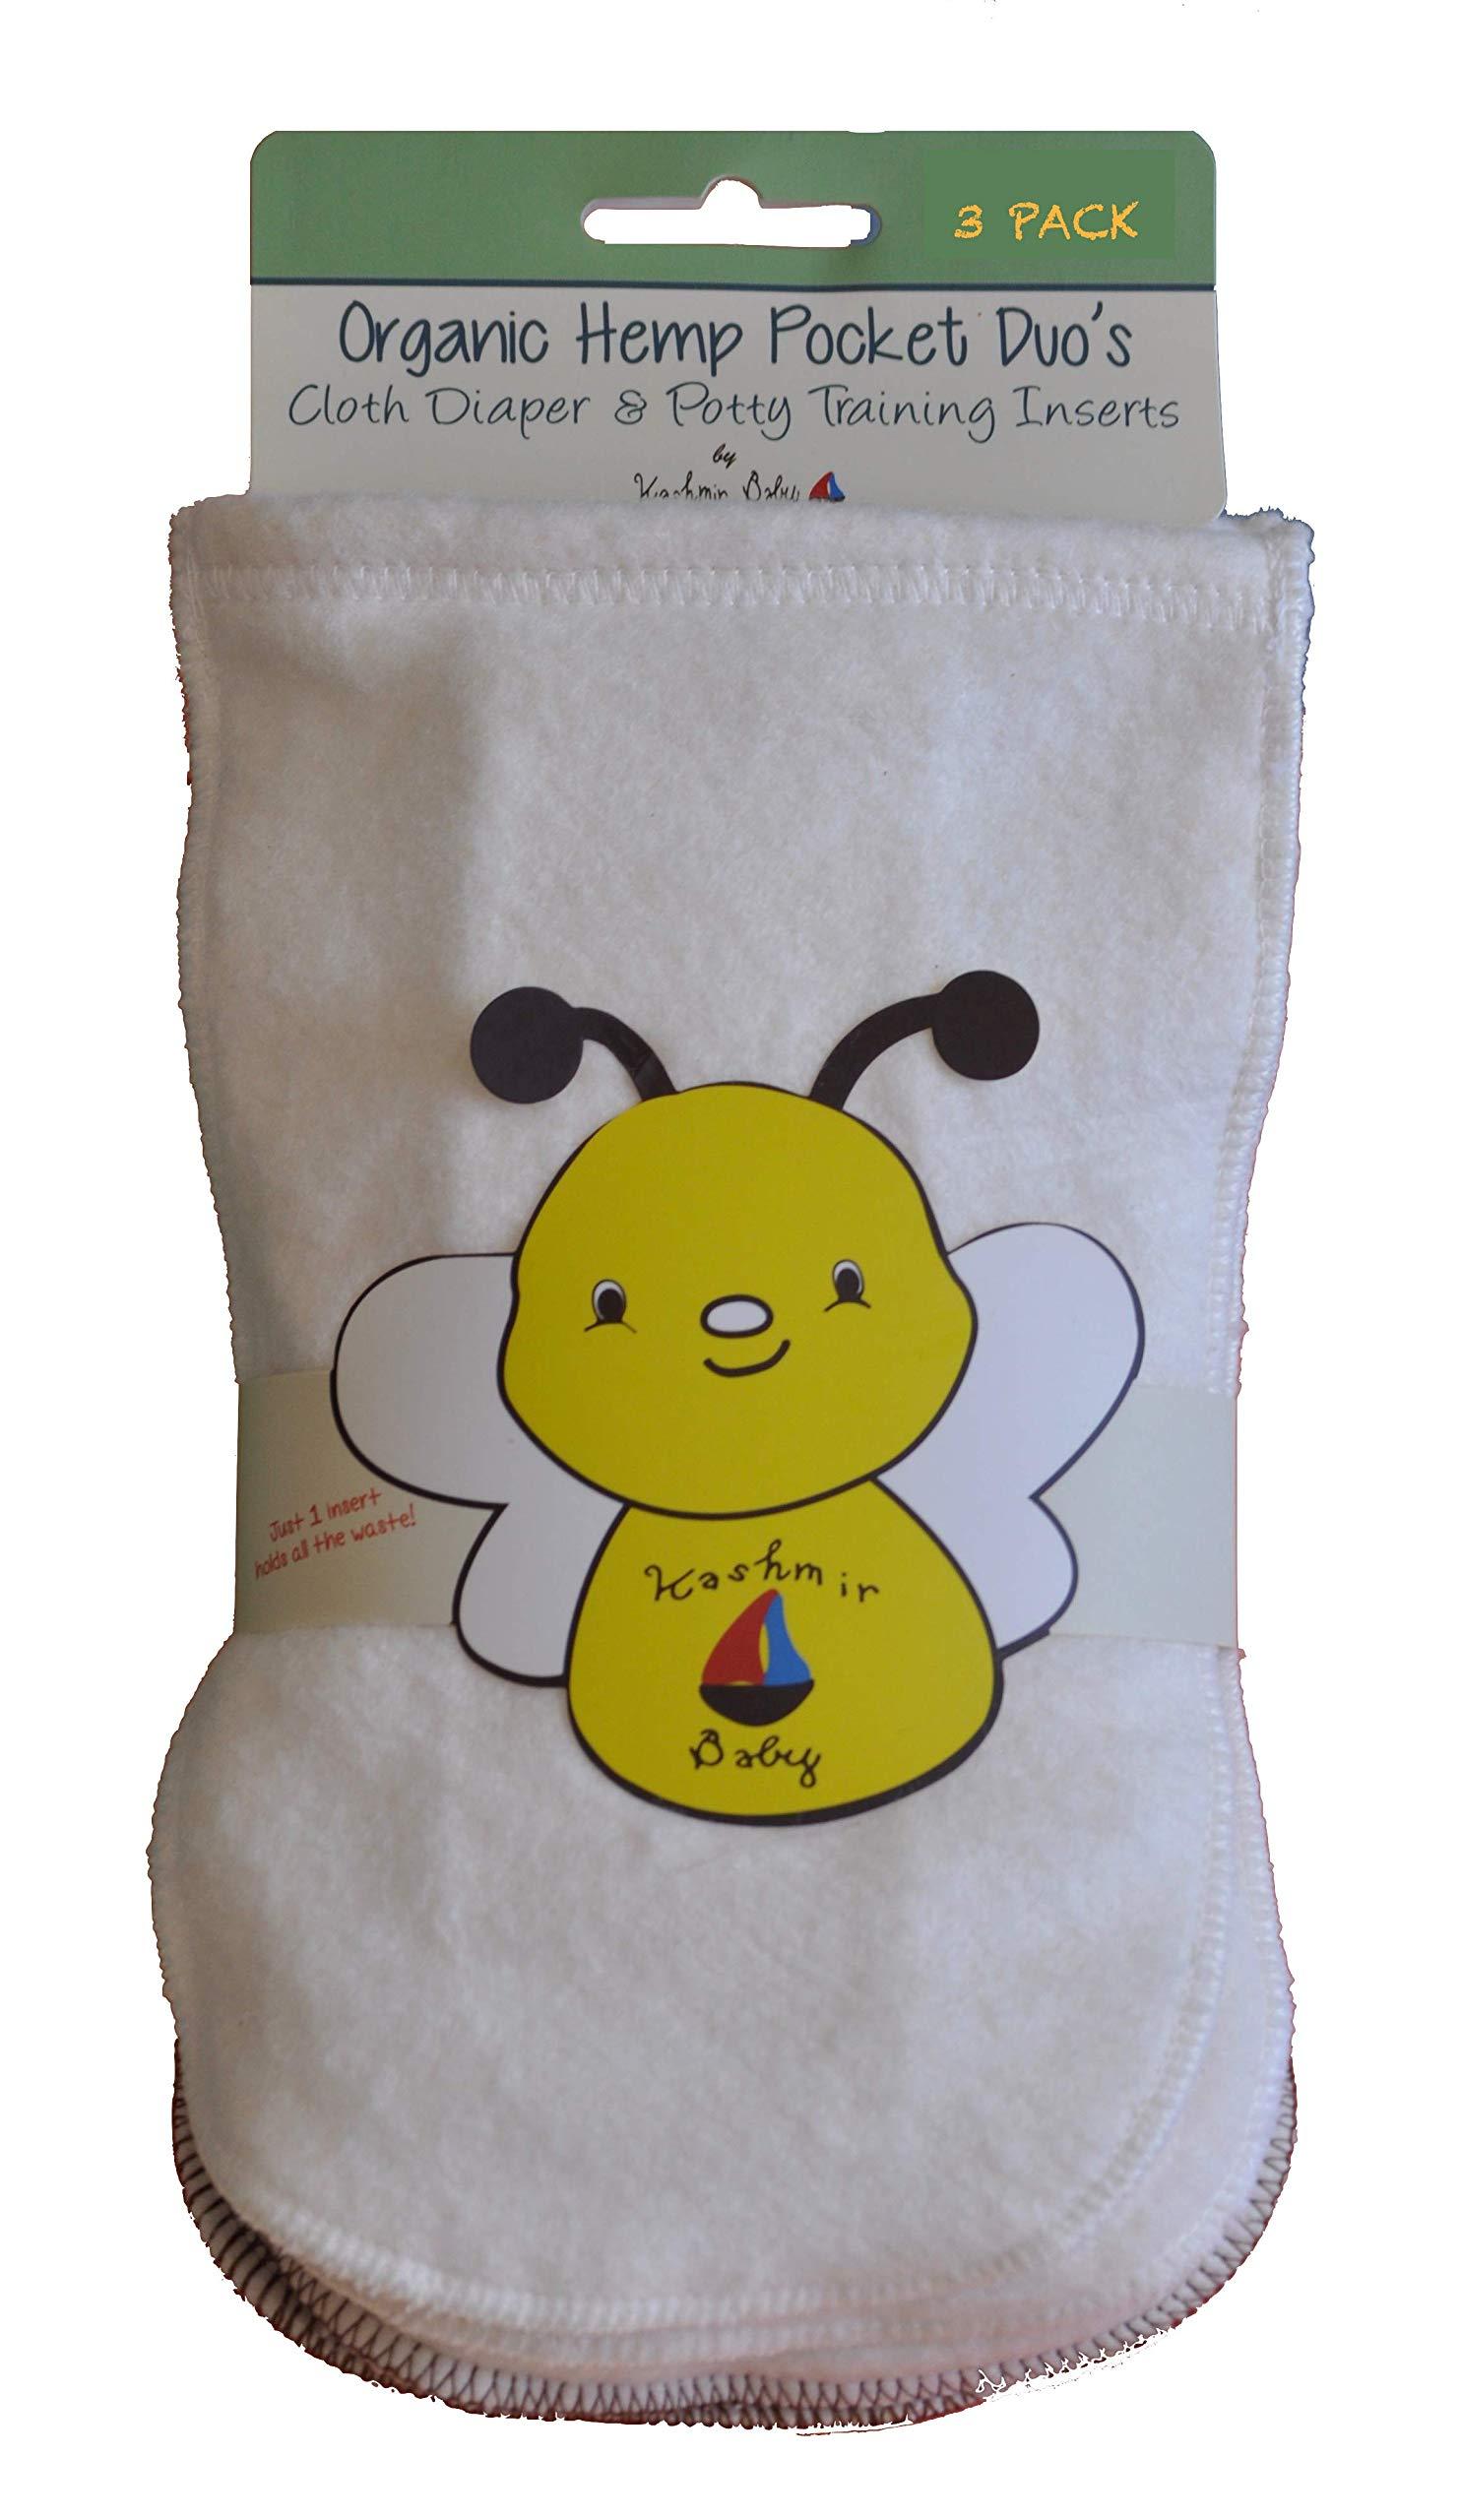 Kashmir Baby Hemp/Organic Cotton Cloth Diaper/Potty Training Inserts 3 Pack Small by Kashmir Baby